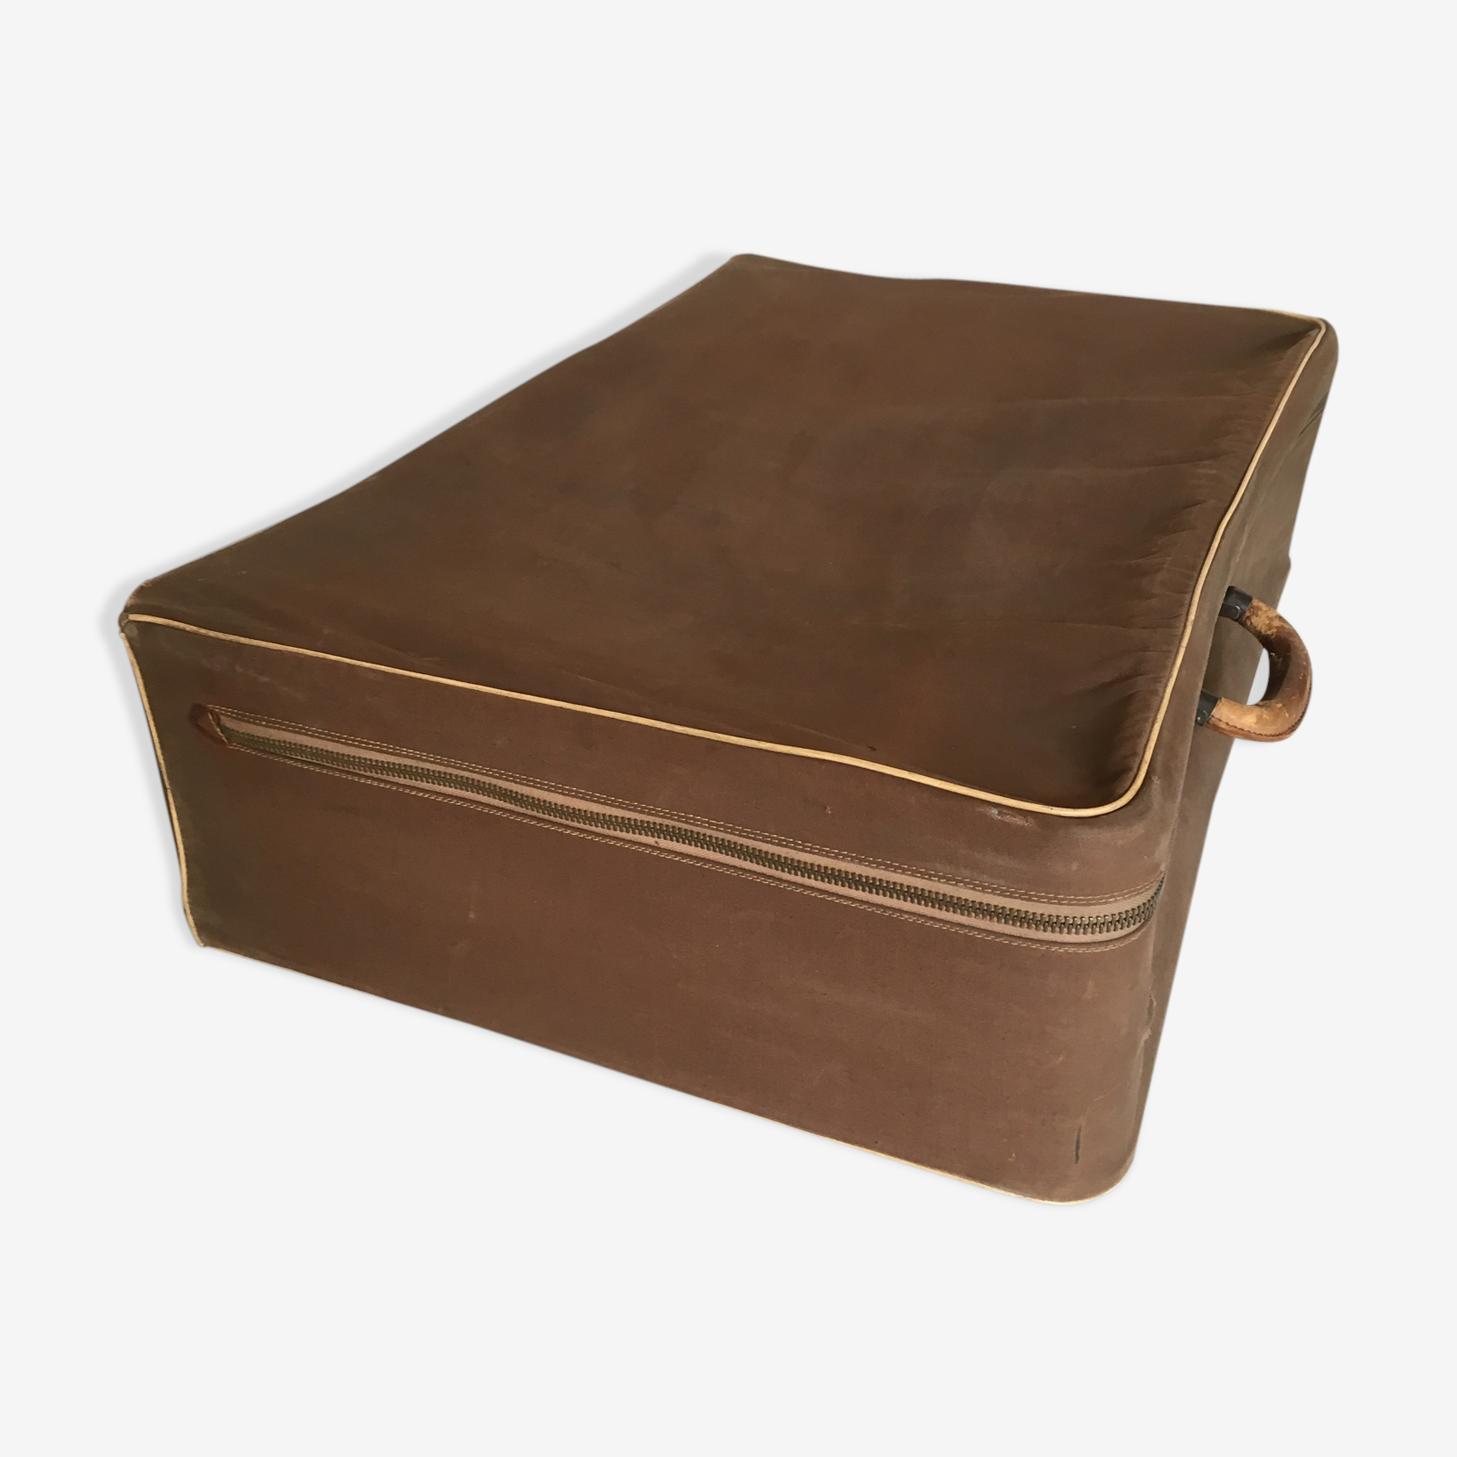 Zipped canvas suitcase, 60s